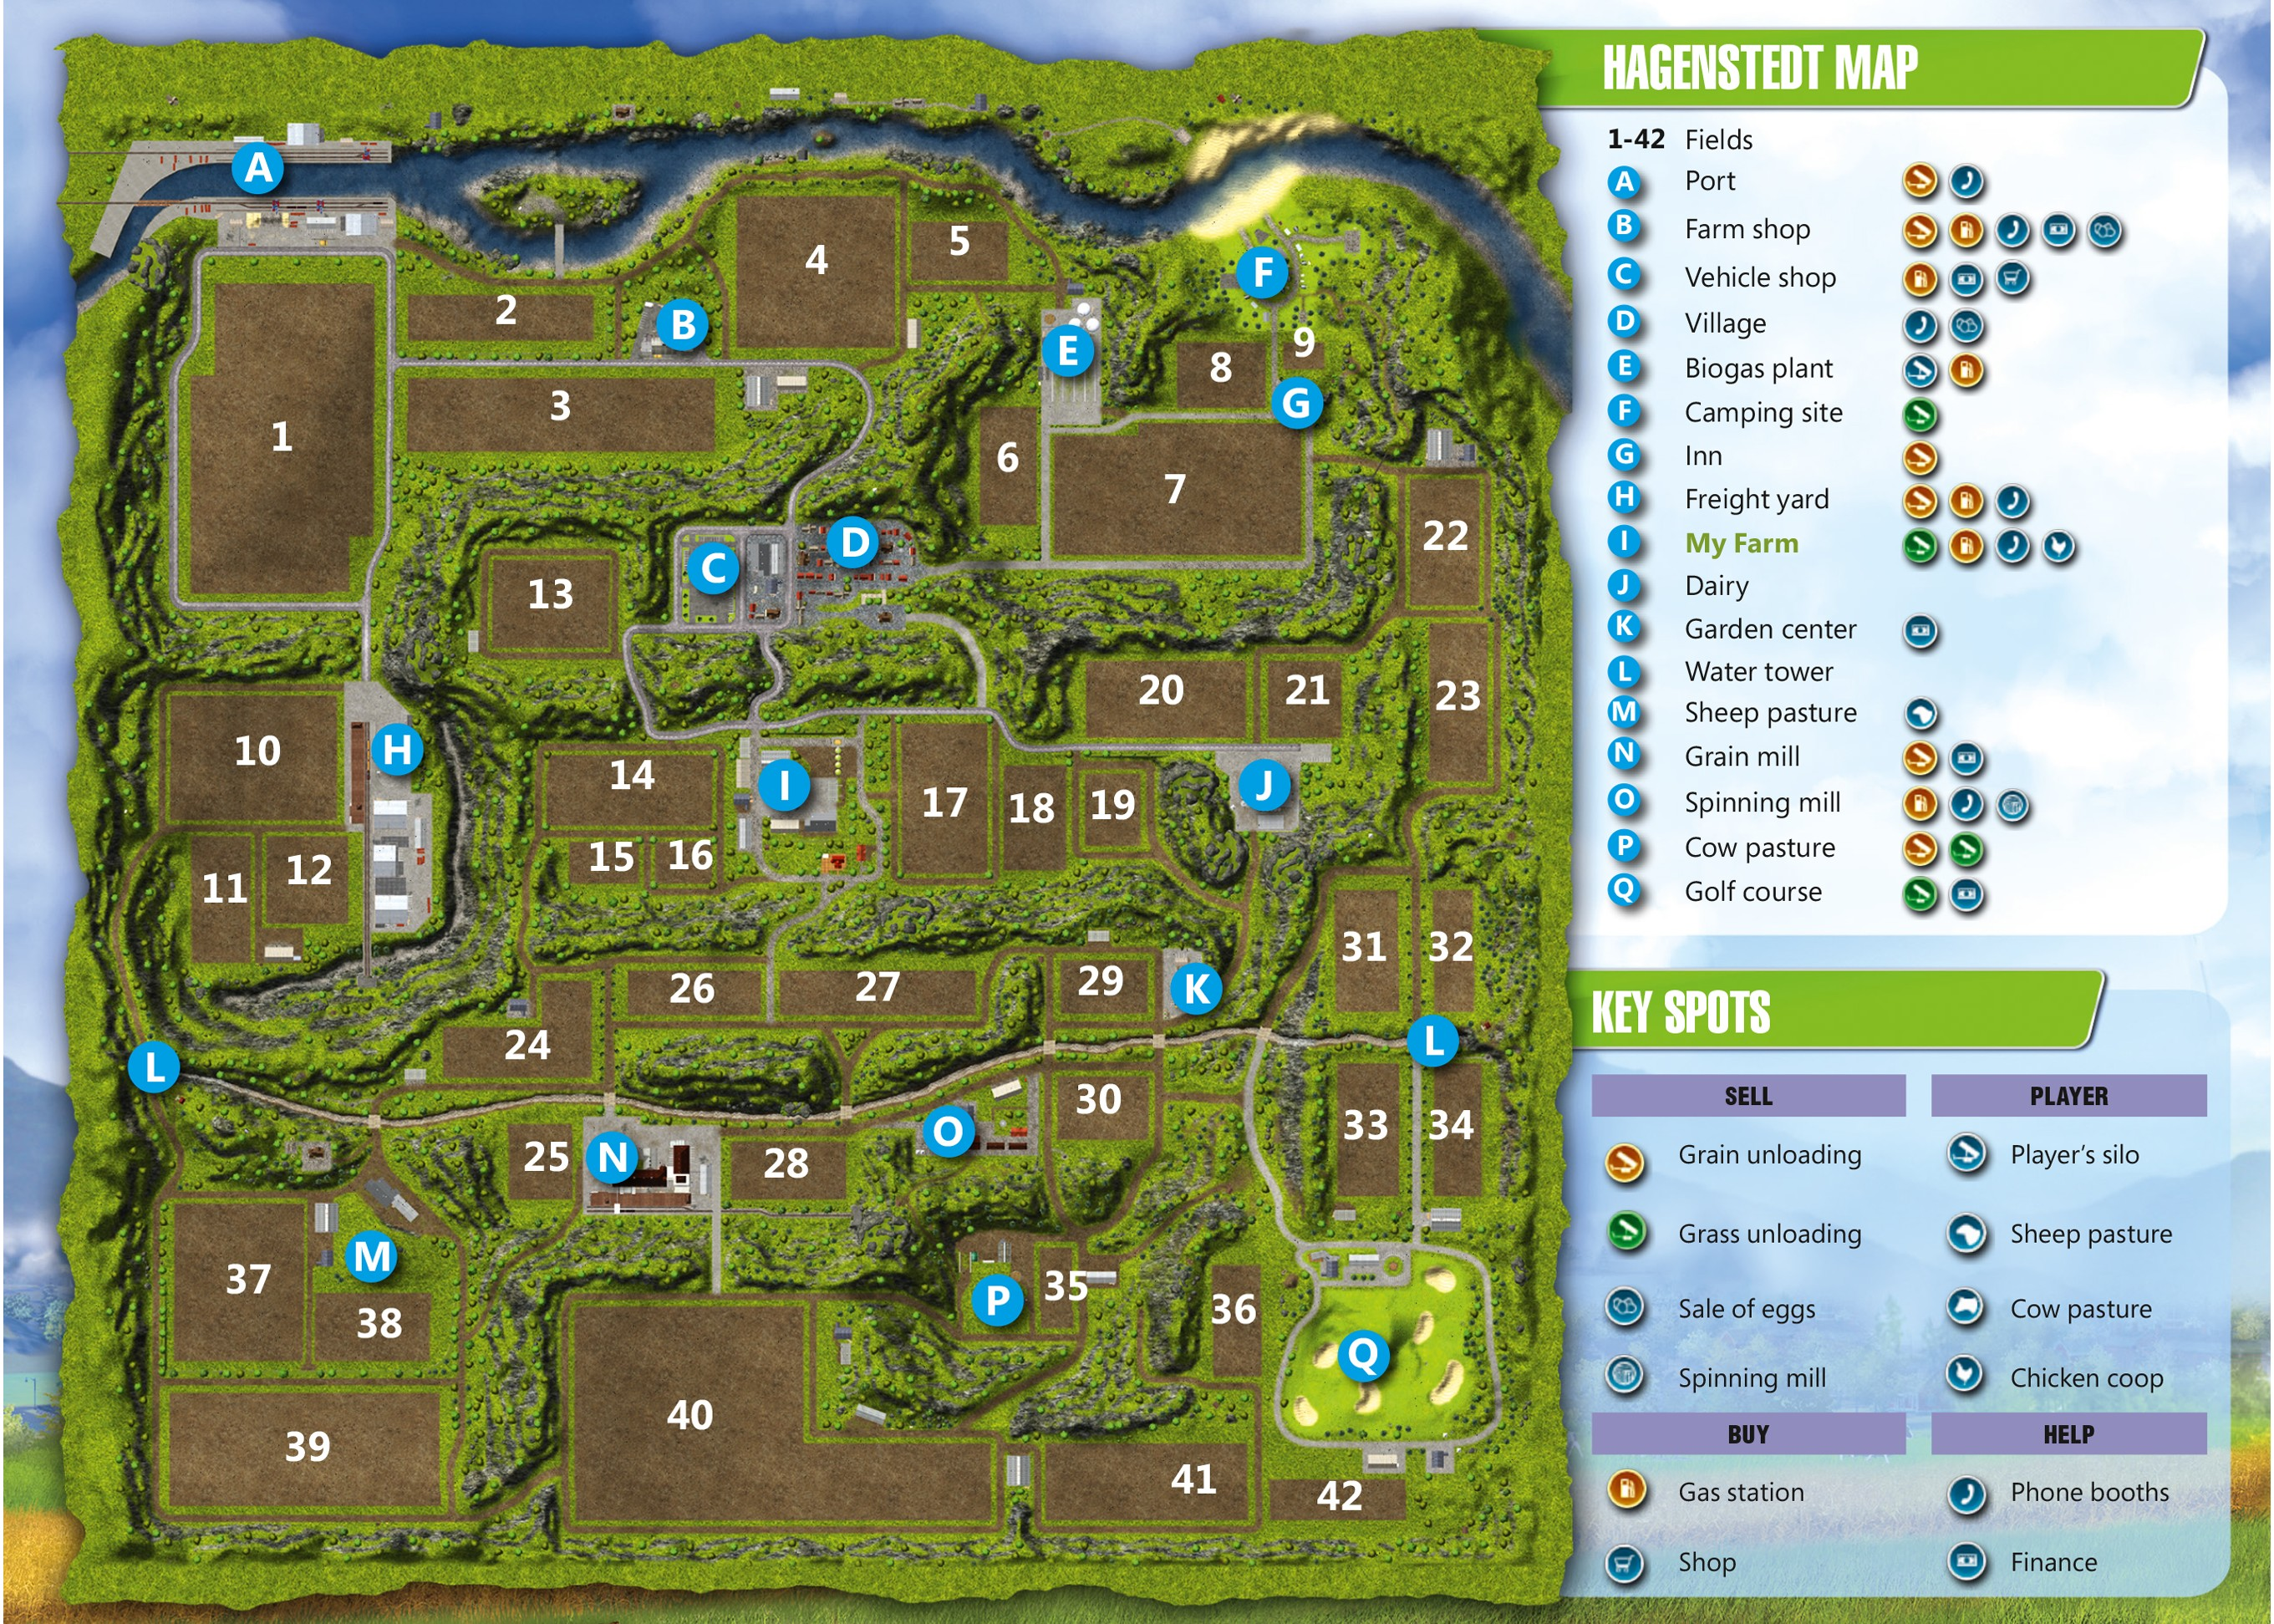 Farming Simulator 2013 Maps Maps (Farming Simulator 2013)   Farming Simulator Wiki   FANDOM  Farming Simulator 2013 Maps